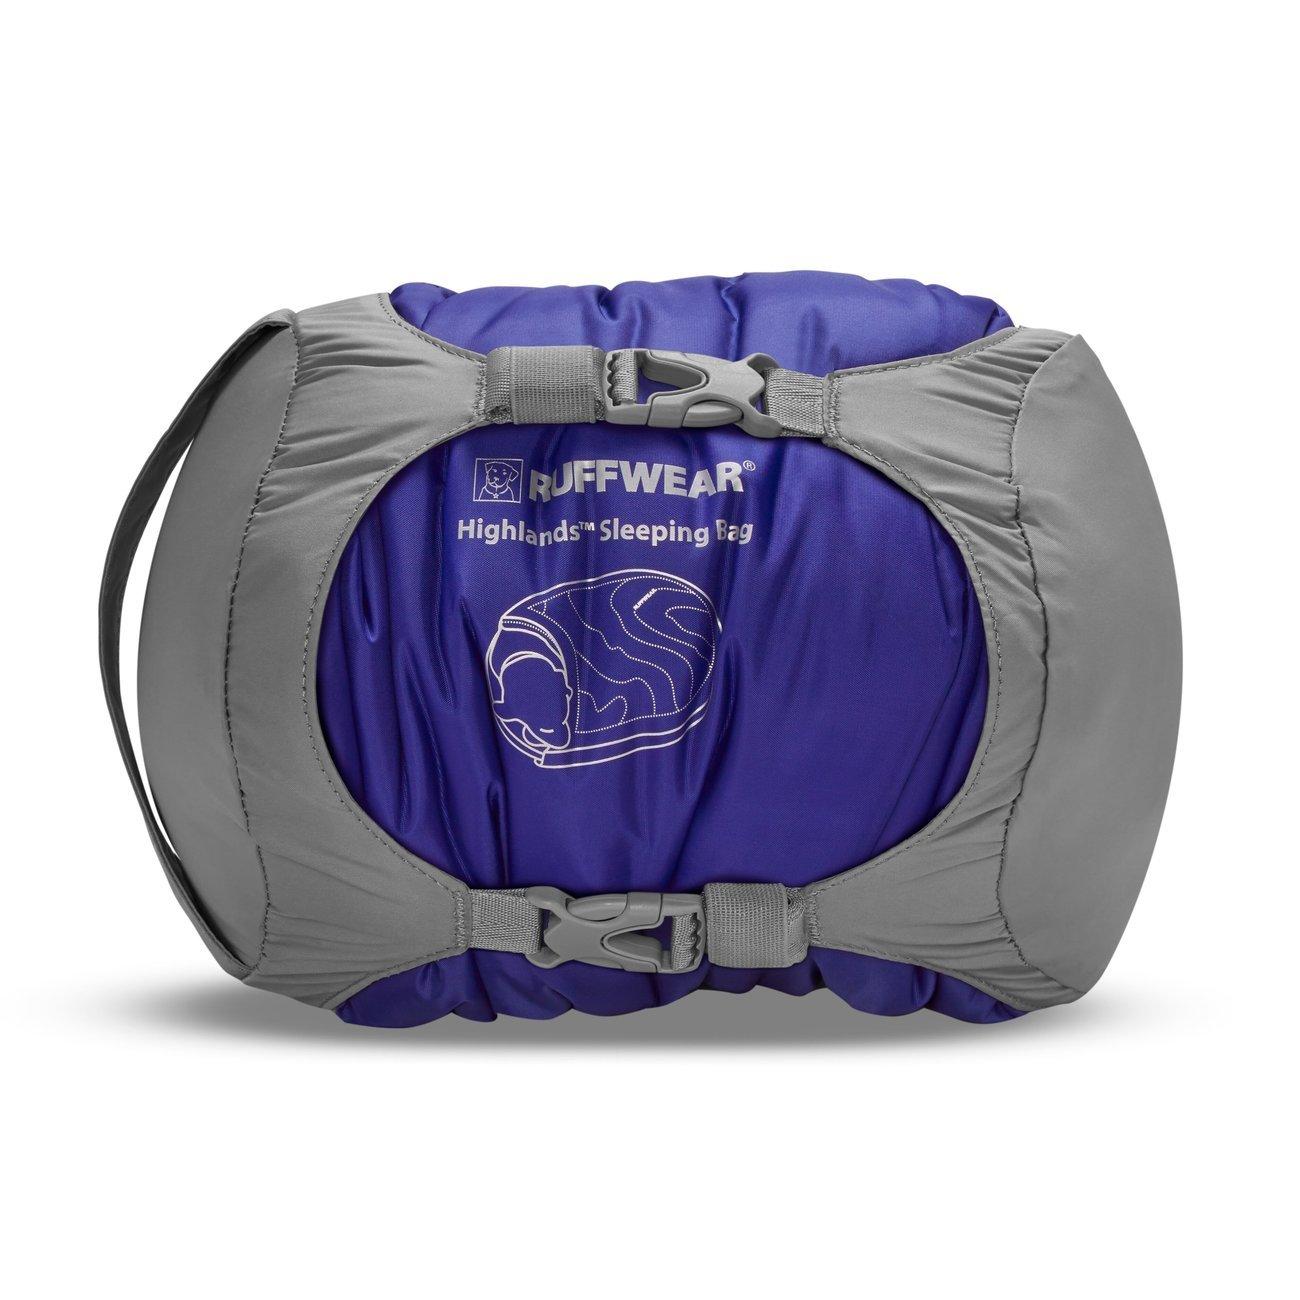 Ruffwear Highlands Sleeping Bag™ Schlafsack für Hunde, Bild 14